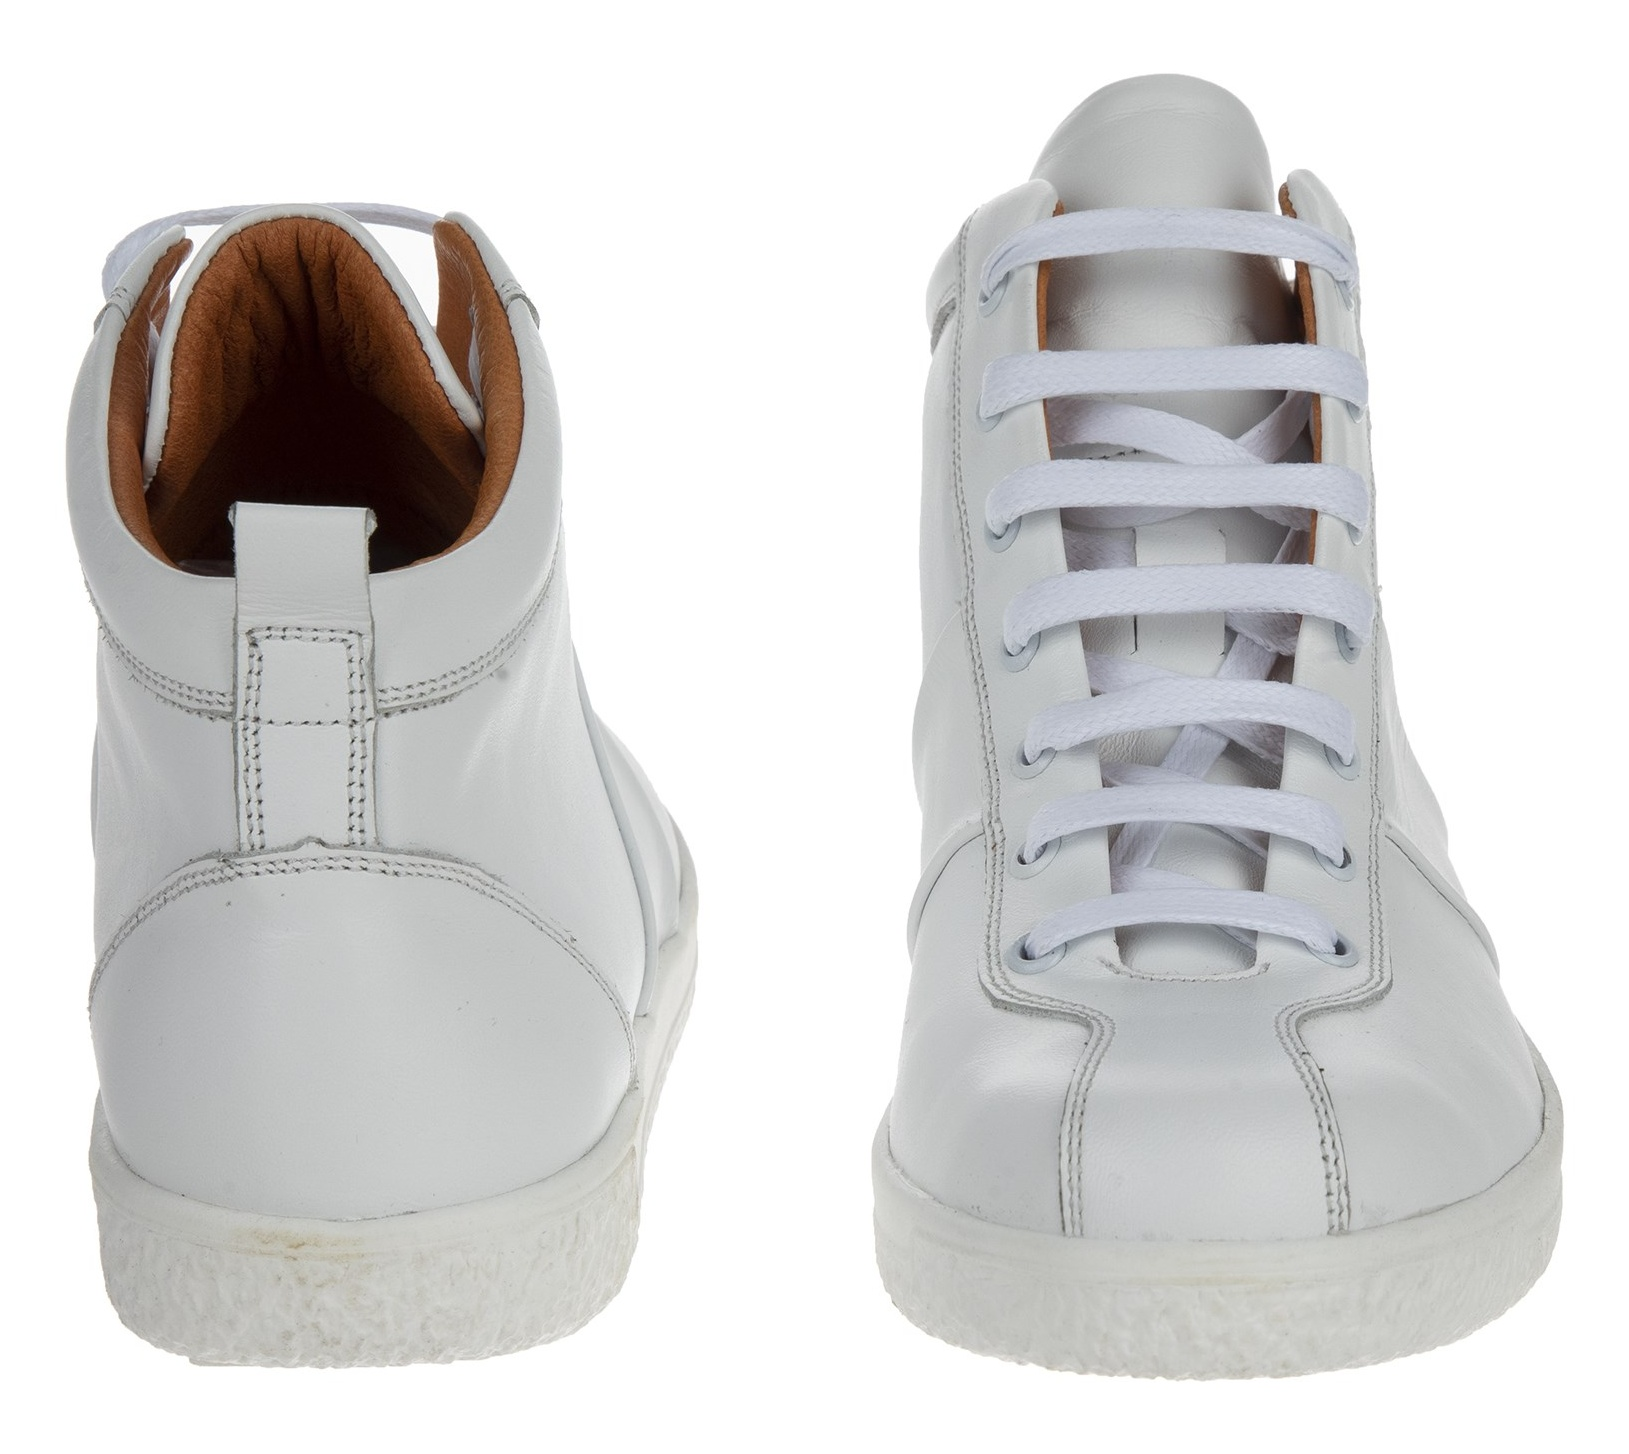 Berttonix women's leather shoes